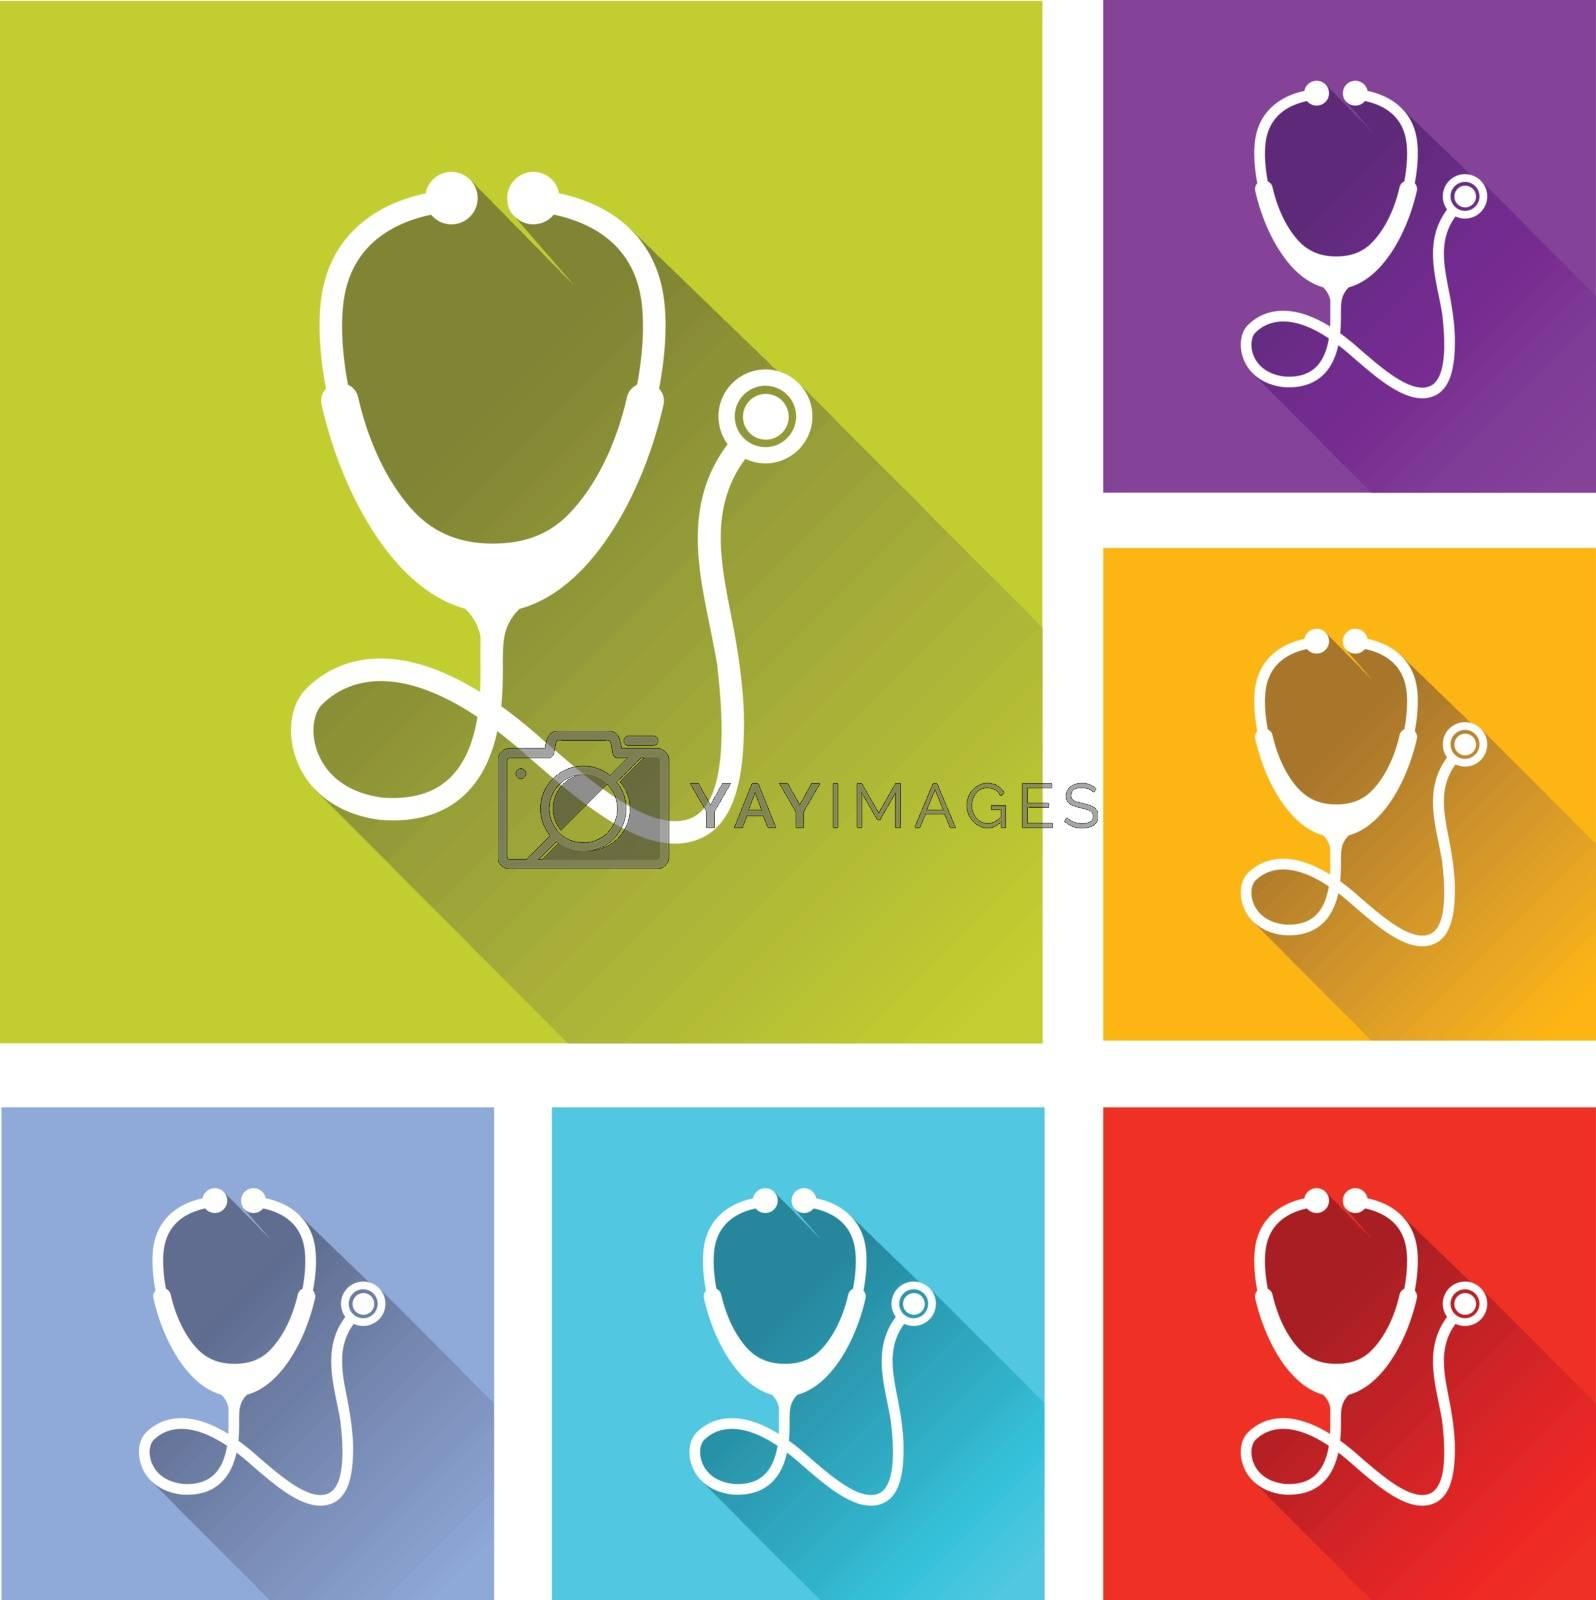 illustration of colorful square stethoscope icons set